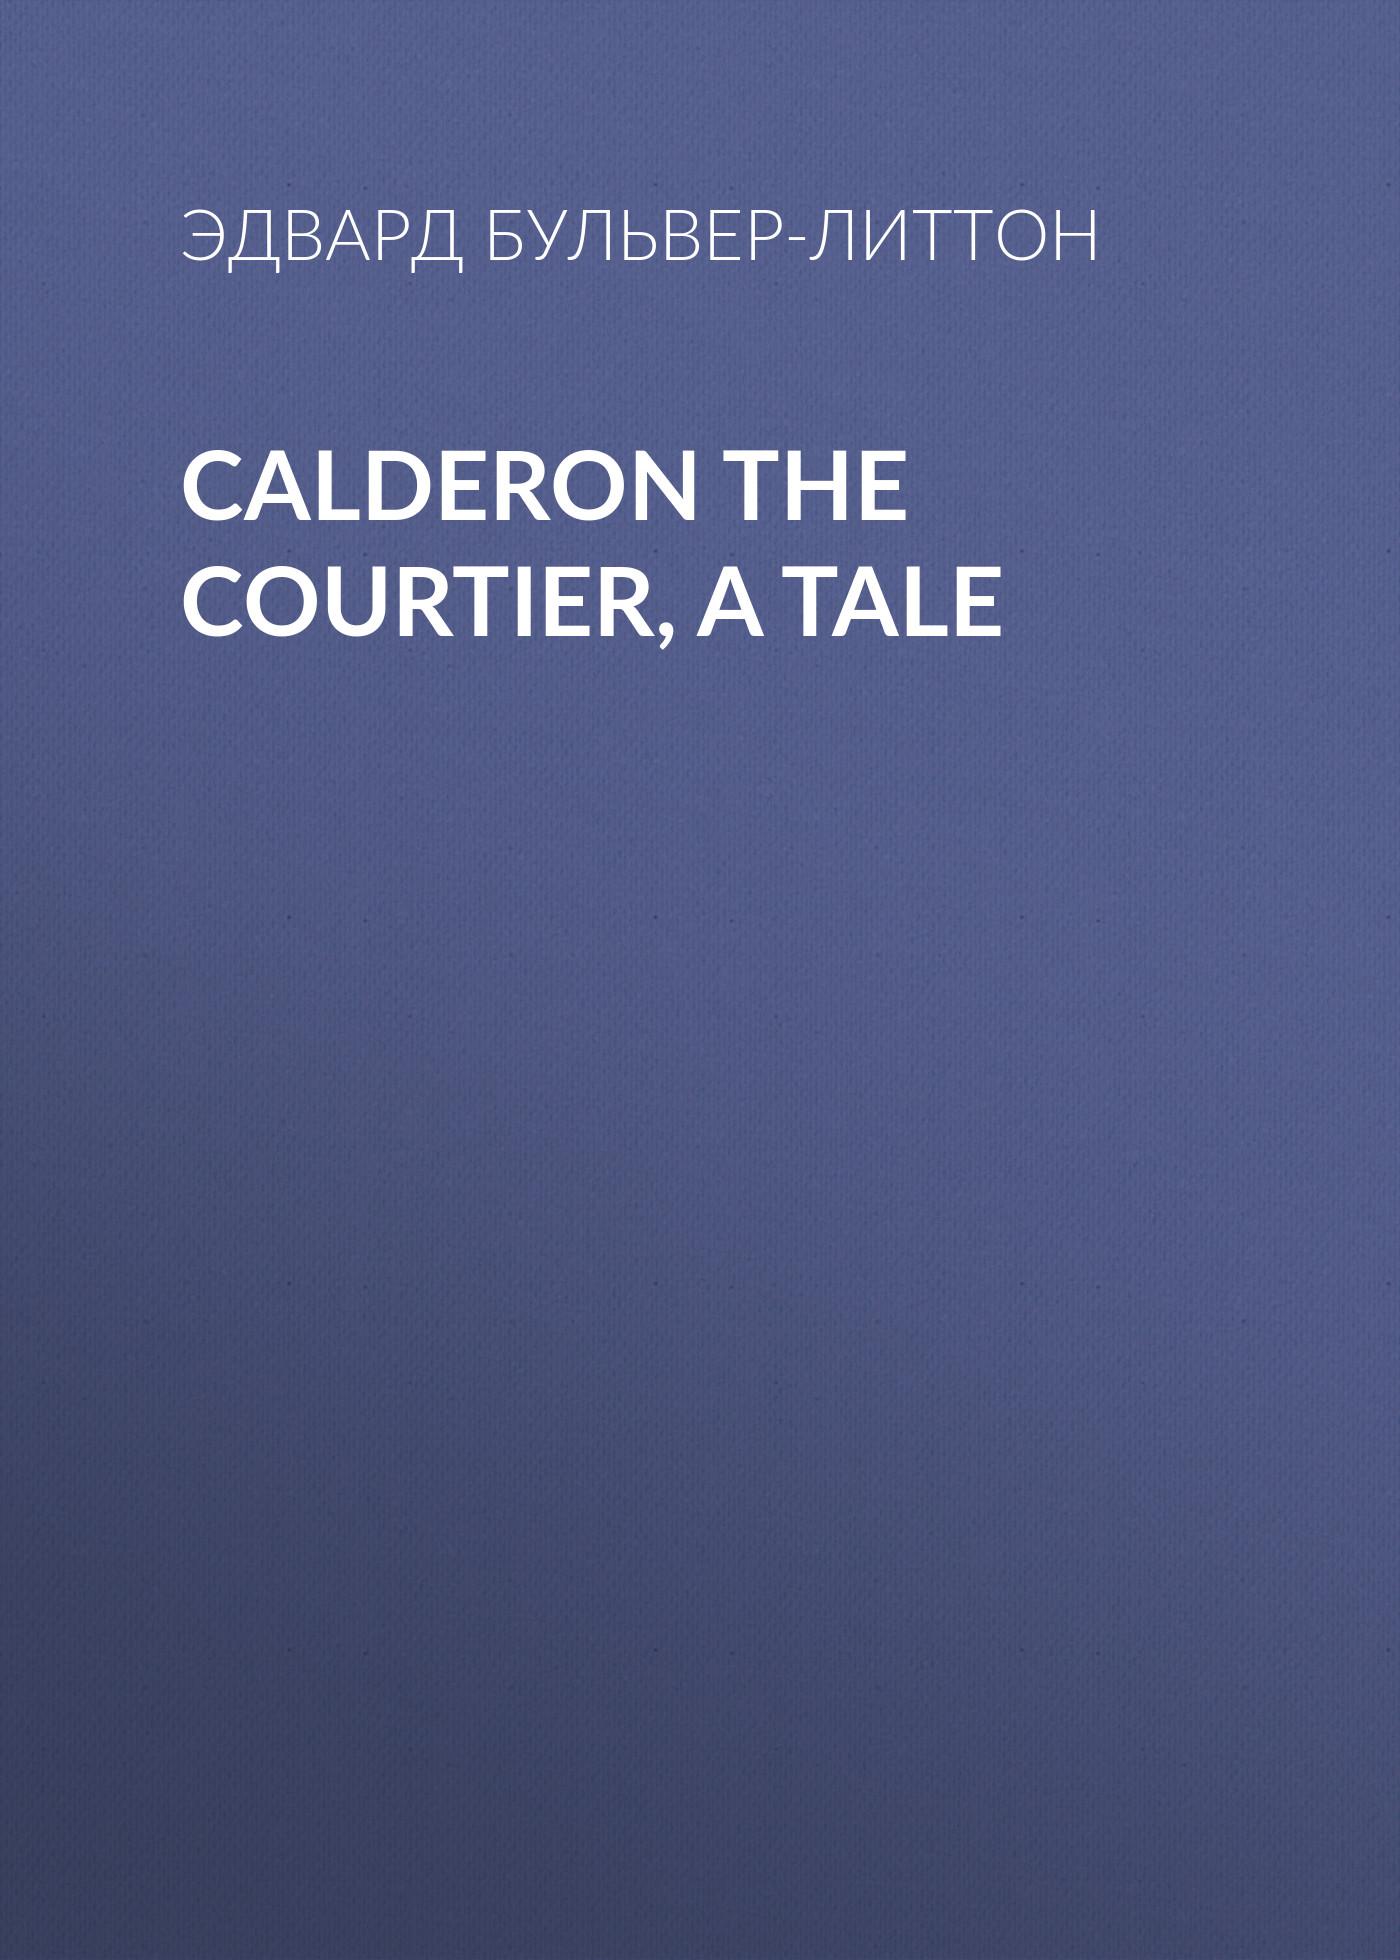 Calderon the Courtier, a Tale ( Эдвард Бульвер-Литтон  )